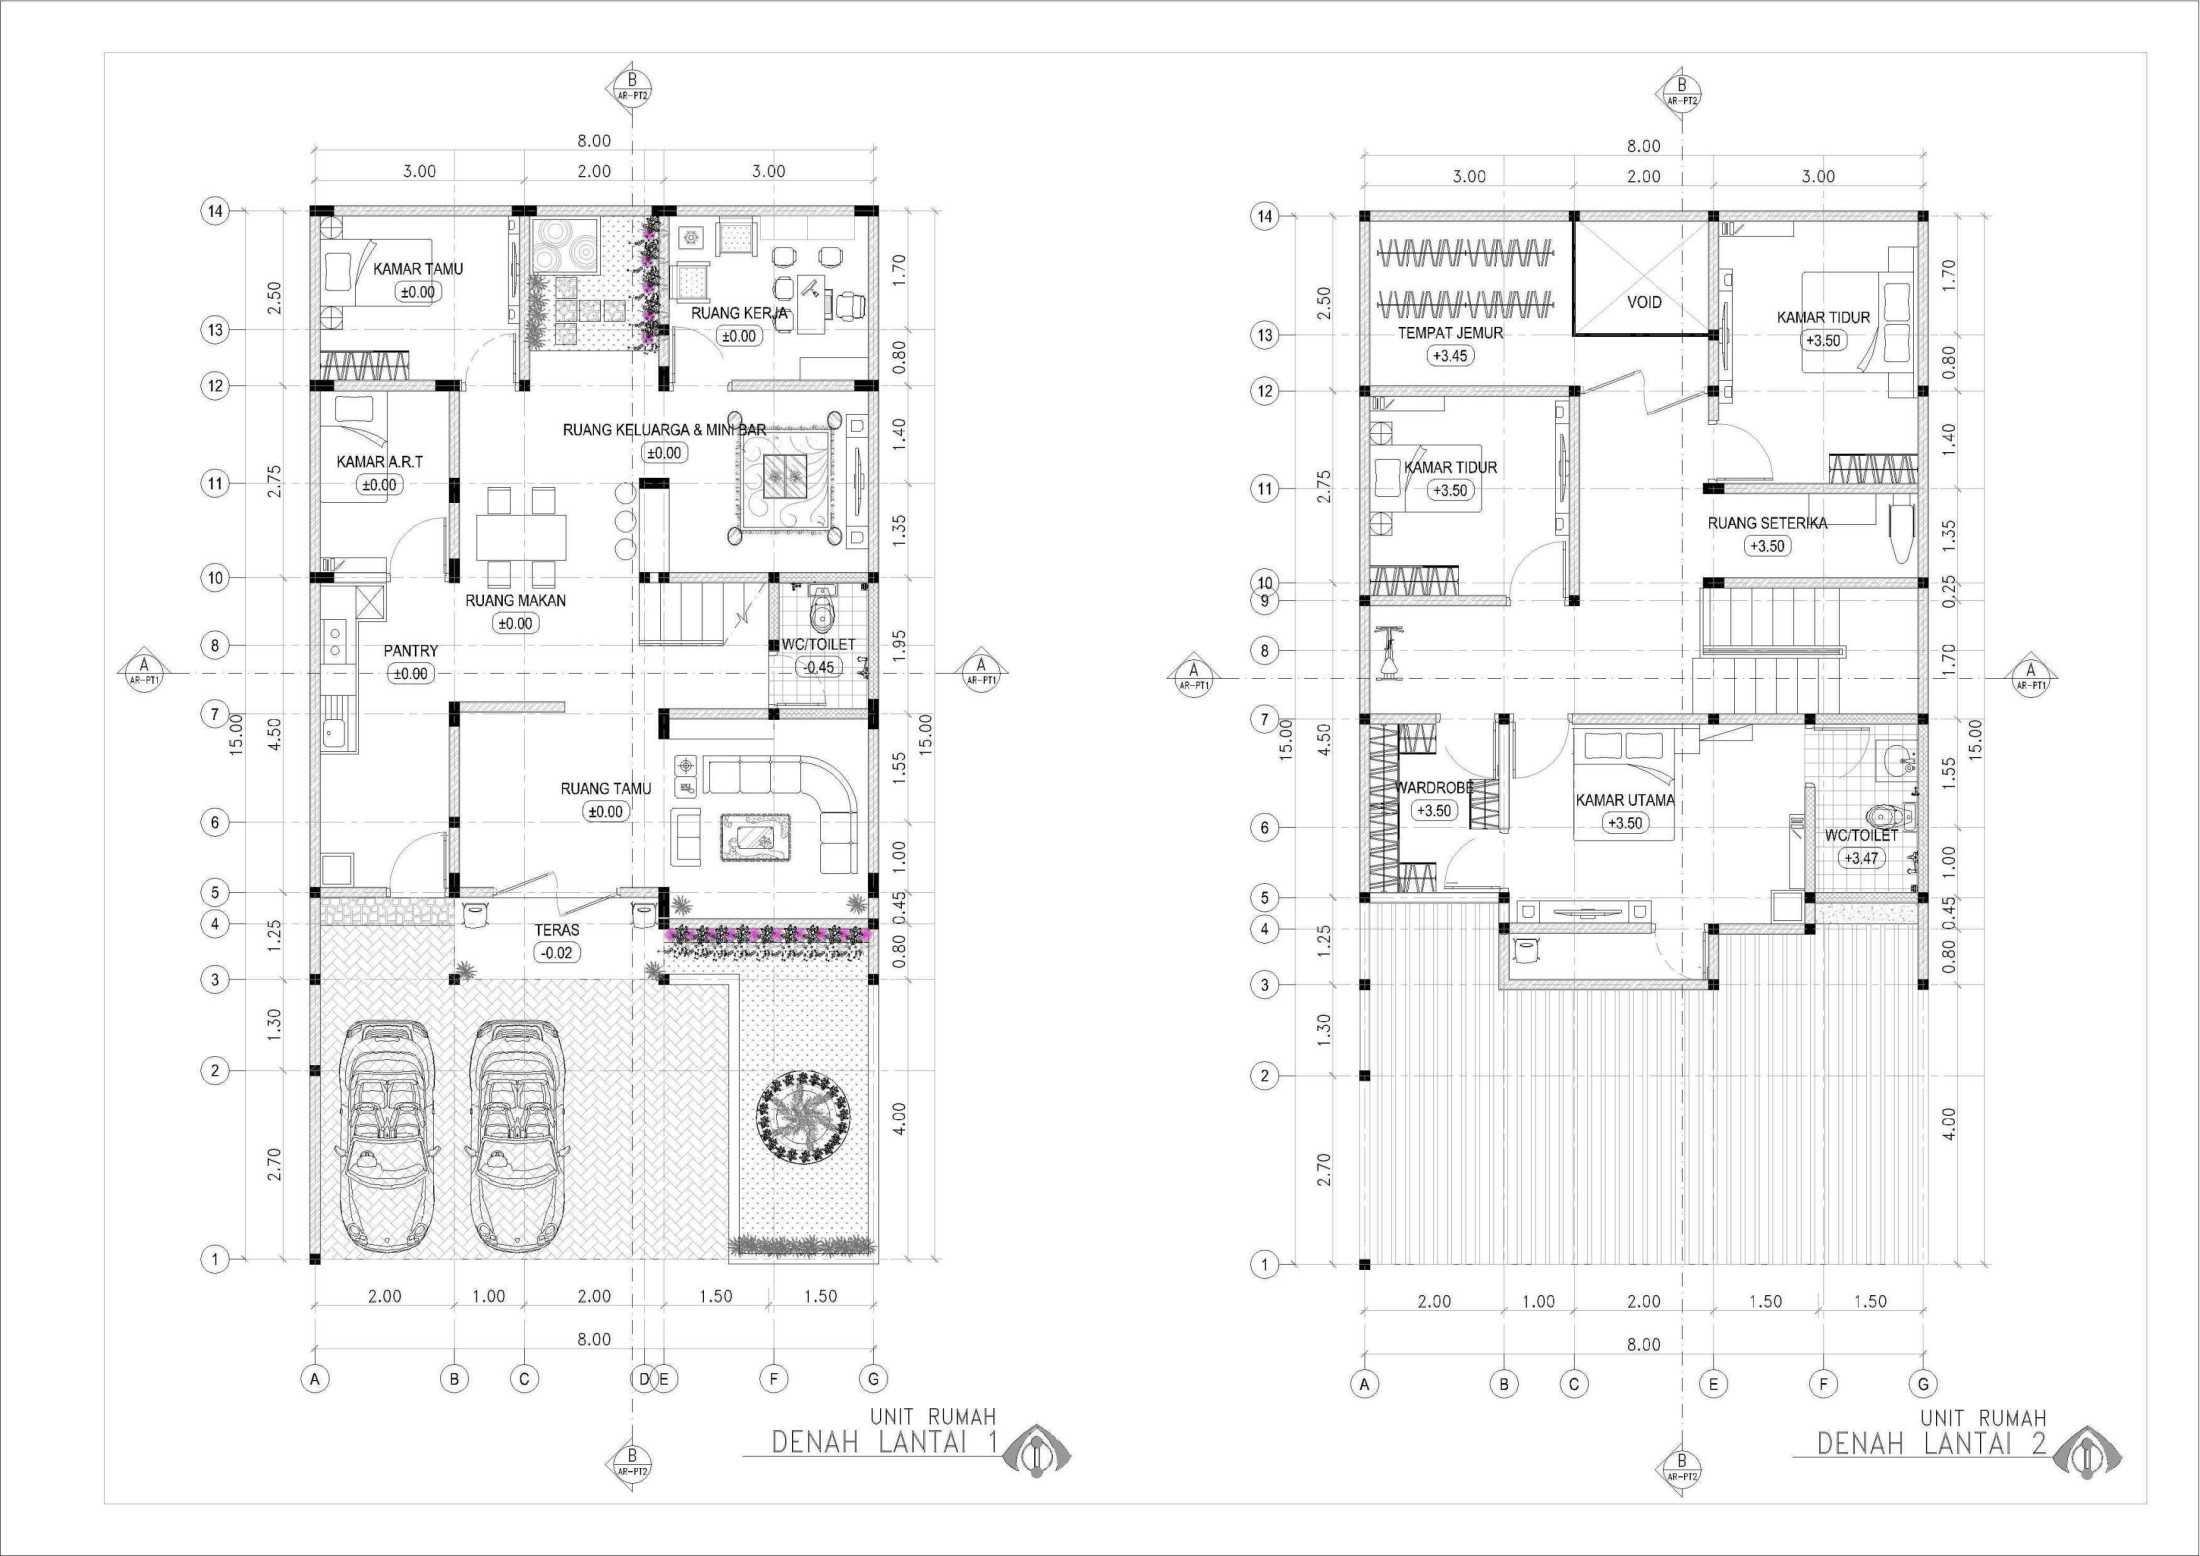 Nuansa Studio 24 Al House Cluster Victoria, Rw.2, Ujung Menteng, Cakung, Kota Jakarta Timur, Daerah Khusus Ibukota Jakarta, Indonesia Cluster Victoria, Rw.2, Ujung Menteng, Cakung, Kota Jakarta Timur, Daerah Khusus Ibukota Jakarta, Indonesia Nuansa-Studio-24-Al-House  70546